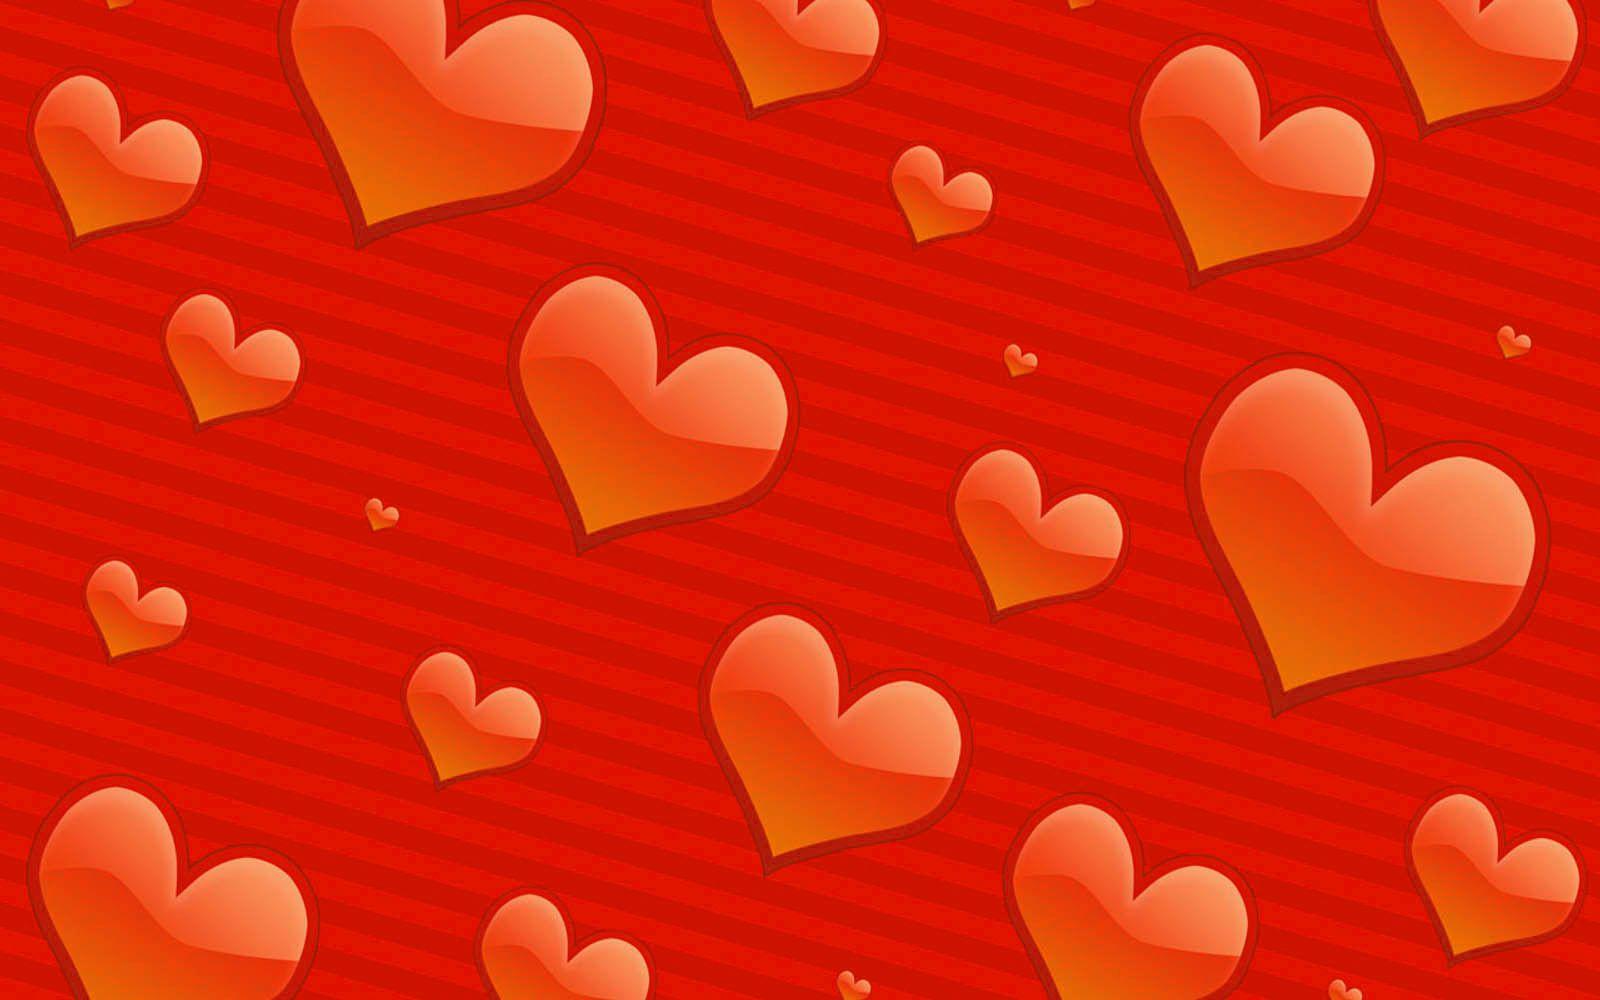 Love symbol wallpaper love wallpaper pinterest wallpaper and love symbol wallpaper buycottarizona Gallery